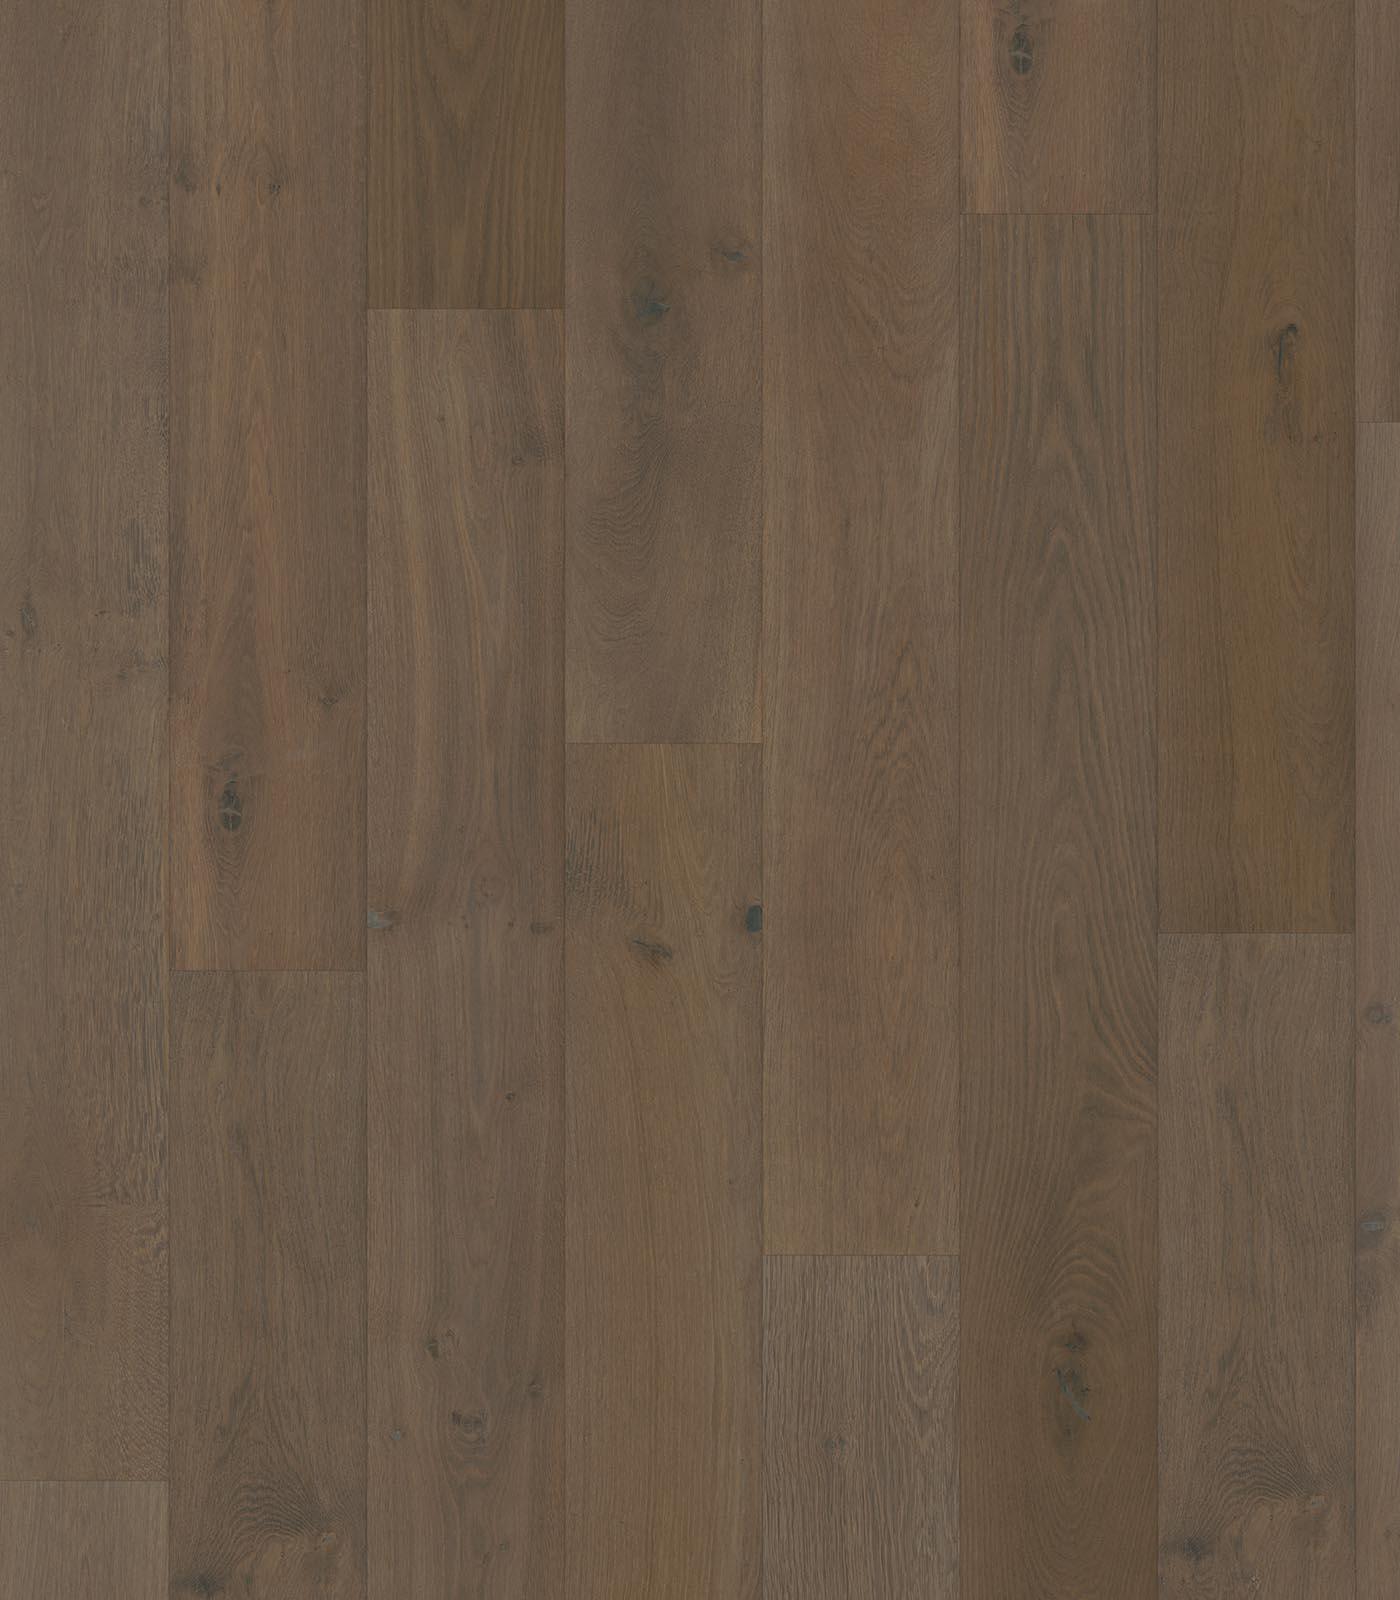 Smoked Neutrino-European oak Floors-Origins Collection-flat